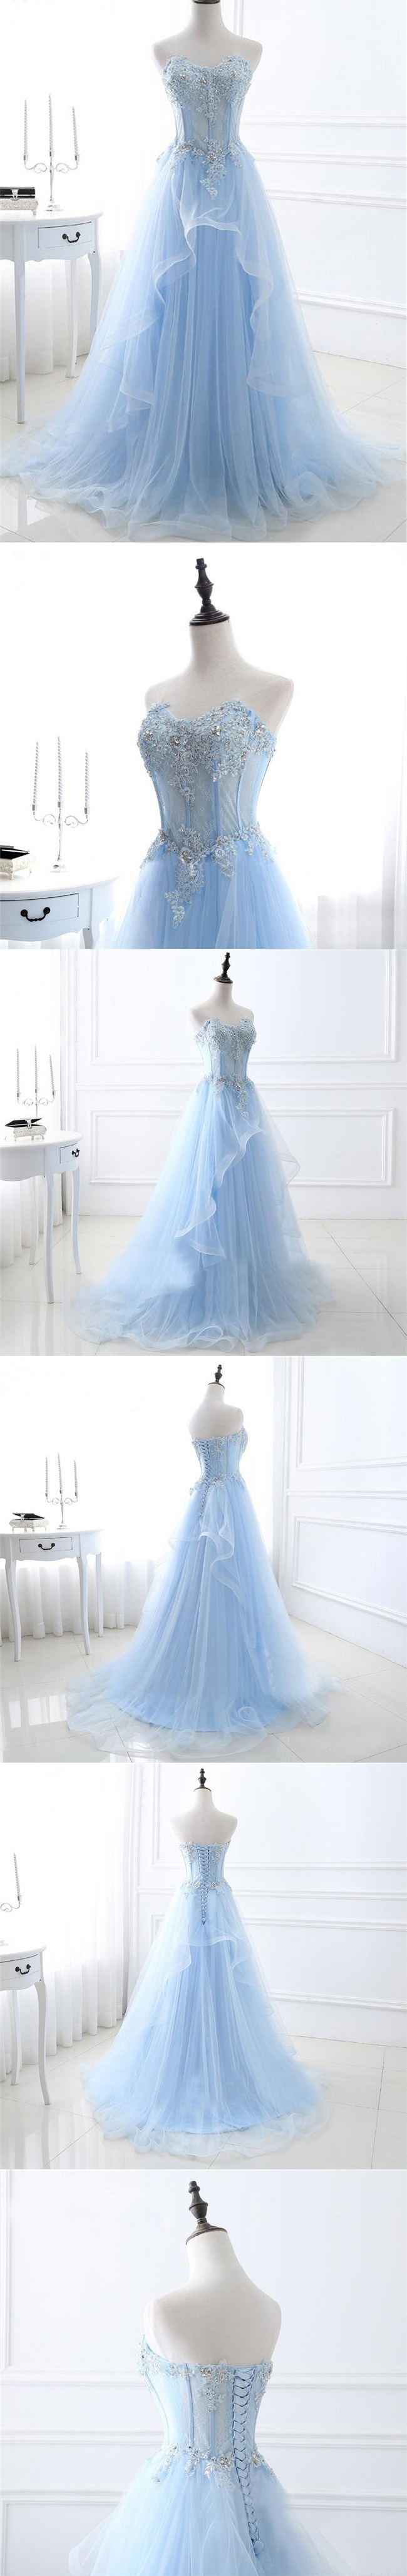 Chic prom dresses sweetheart aline floorlength sexy prom dress